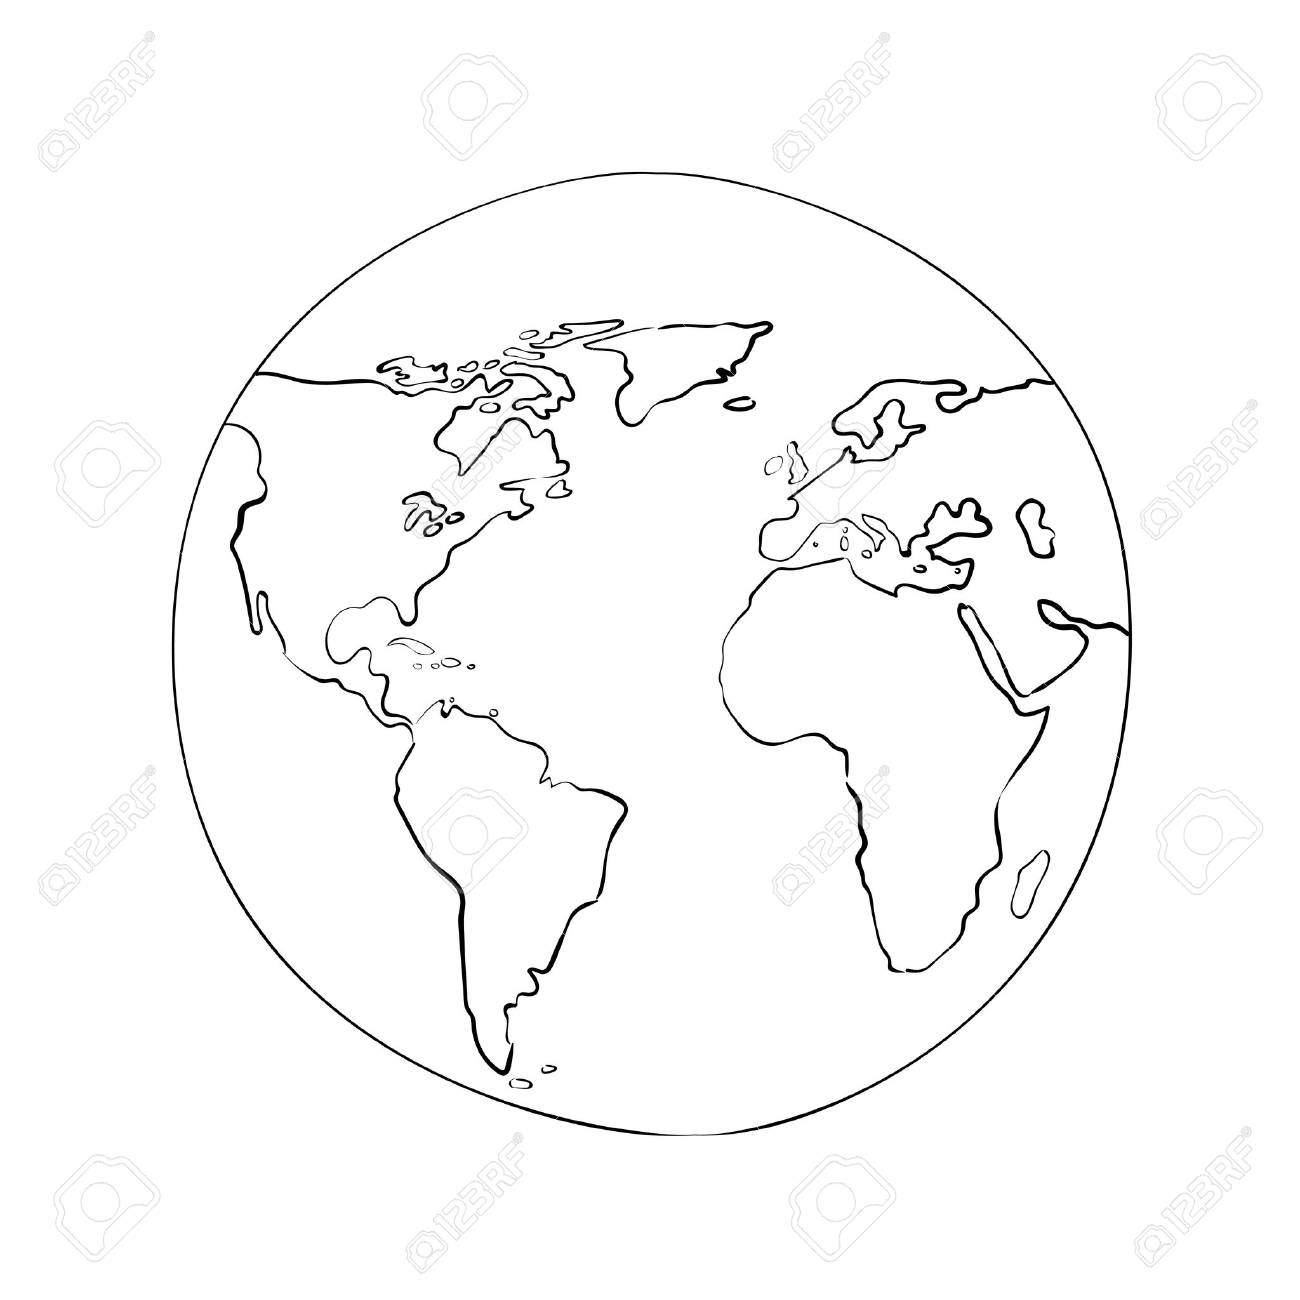 Sketch globe world map black vector illustration royalty free sketch globe world map black vector illustration stock vector 33395879 gumiabroncs Image collections